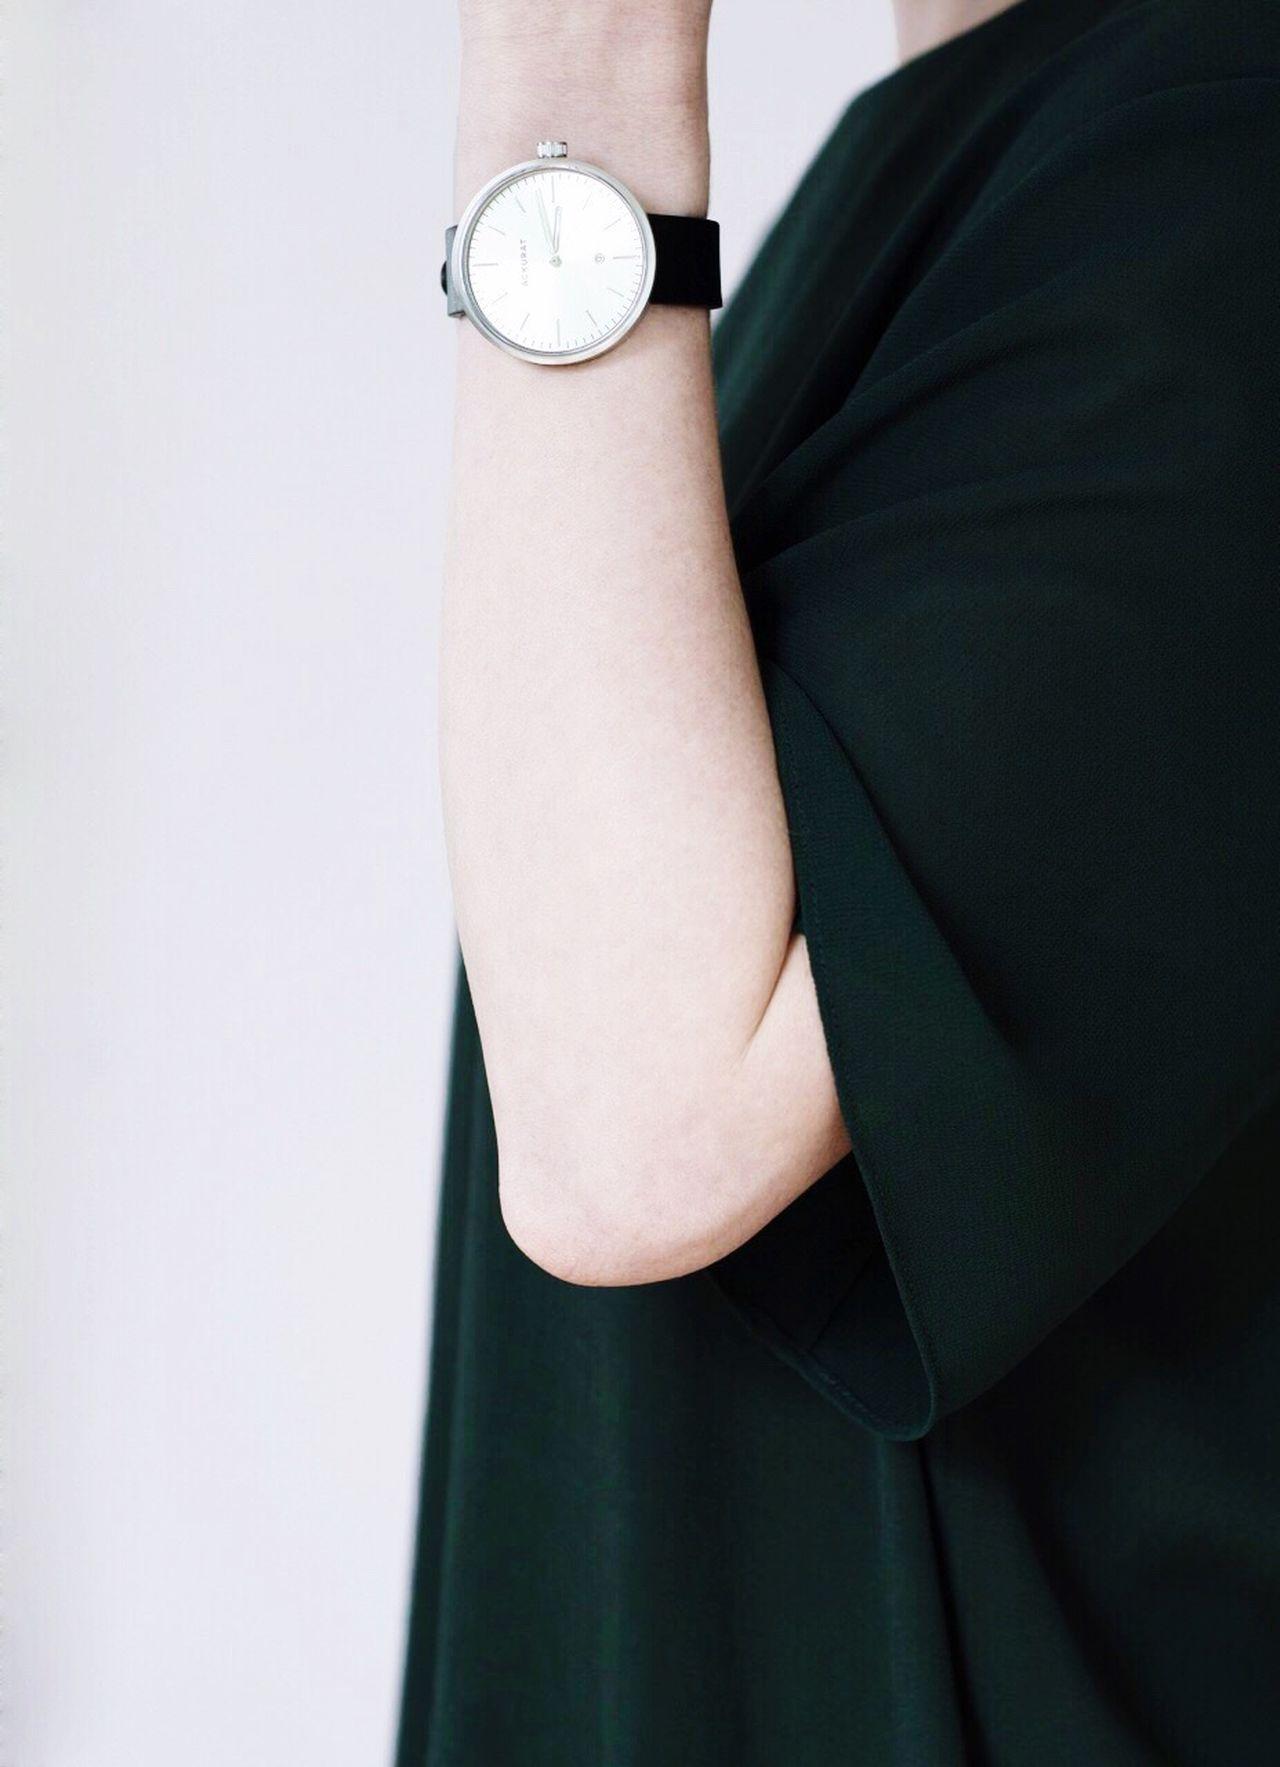 Studio Shot Close-up Clock People Vscocam VSCO Lifestyles EyeEm Best Shots EyeEm Gallery Contemporary Women Fashion Design